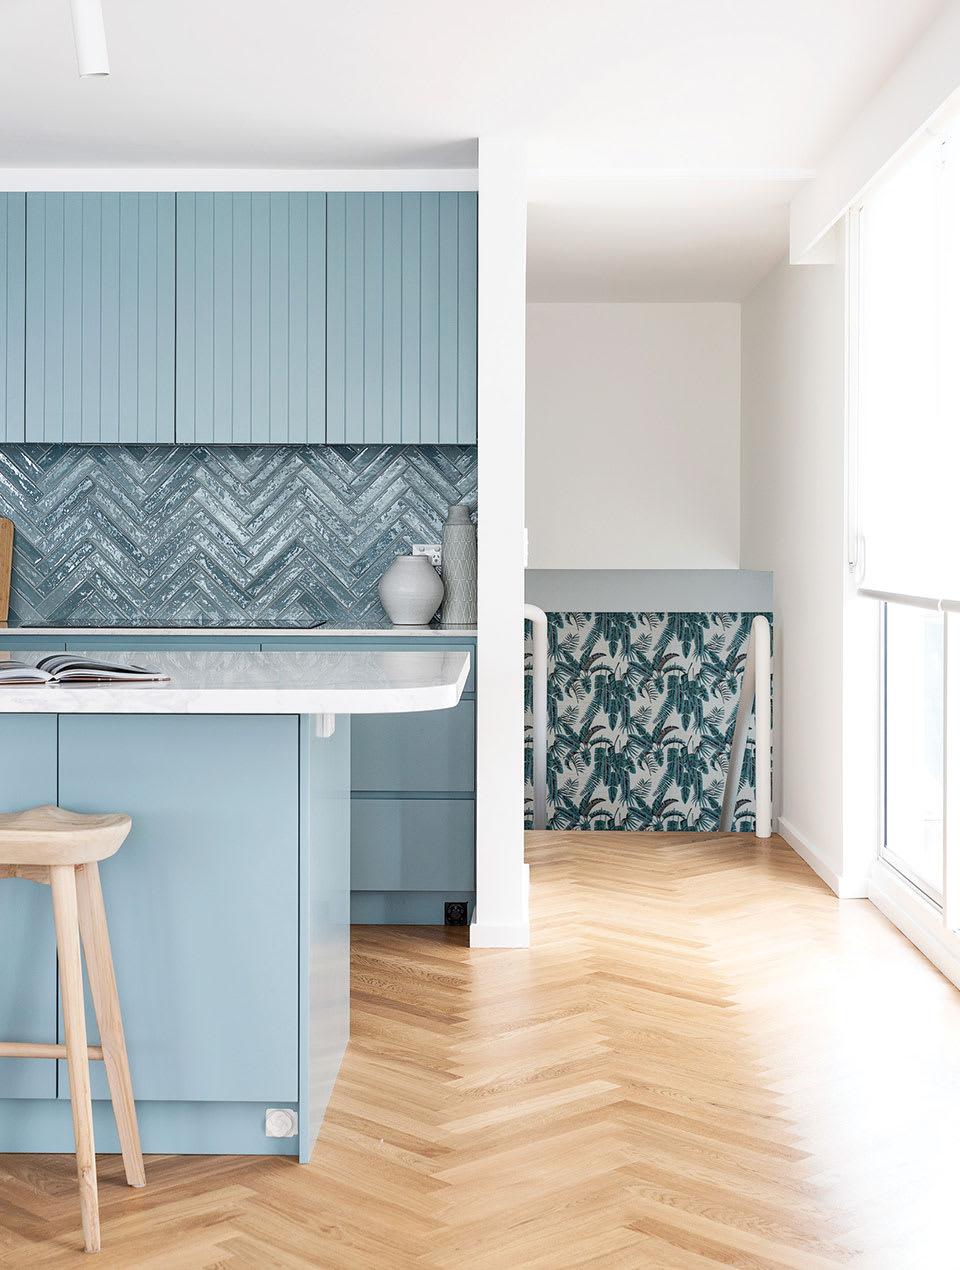 Project | AU | HW16002 Pallido Herringbone | Your Beautiful Home North Steyne Home 05 Portrait